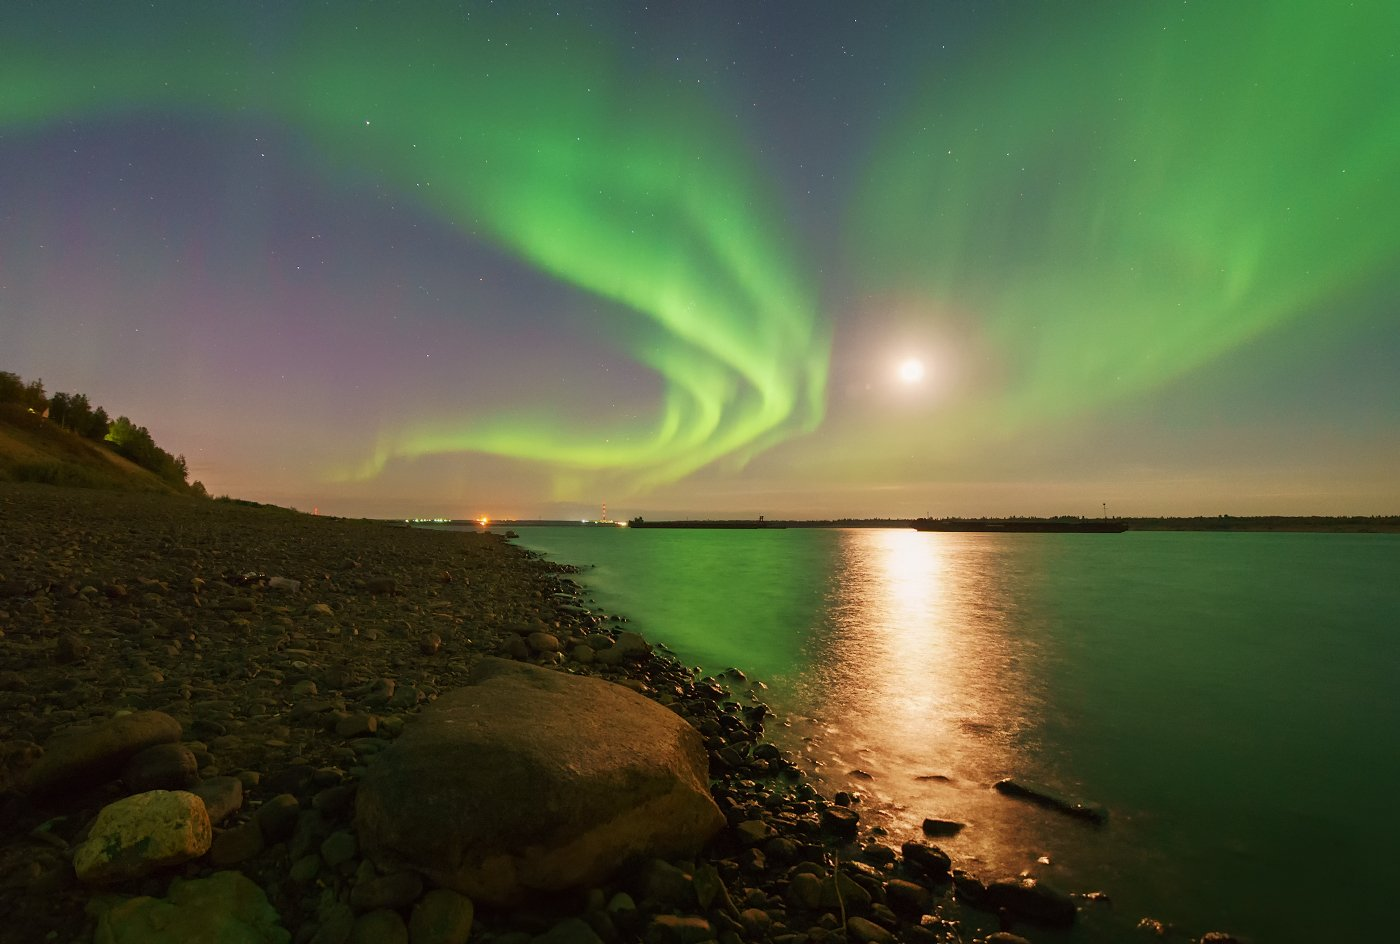 Aurora borealis, Коми, Луна, Печора, Северное сияние, Игорь Подобаев